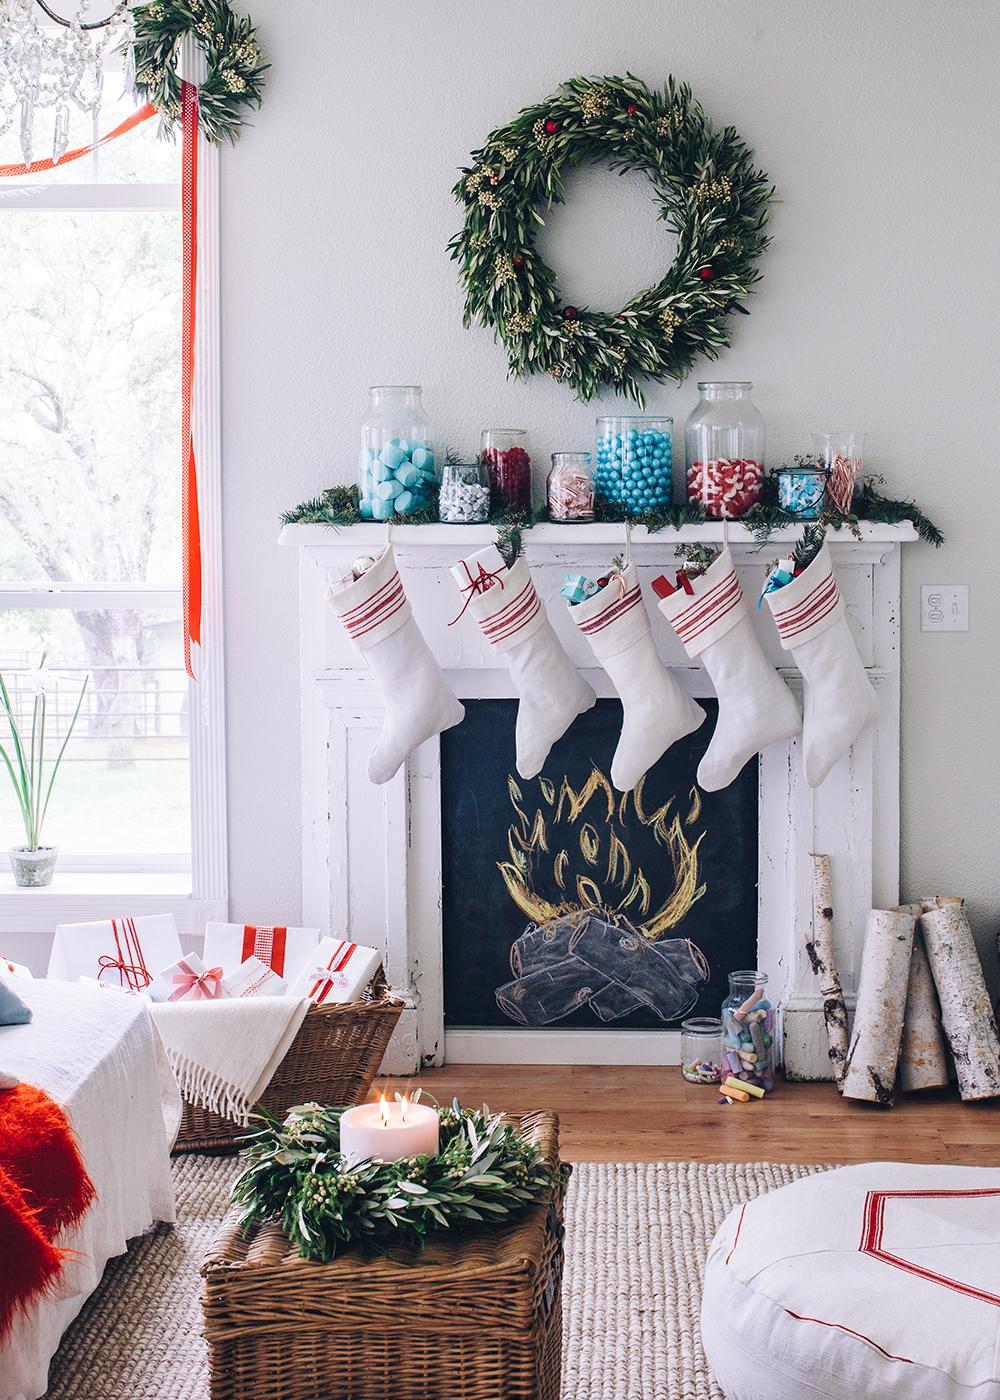 6 Creative Christmas Decorating Ideas